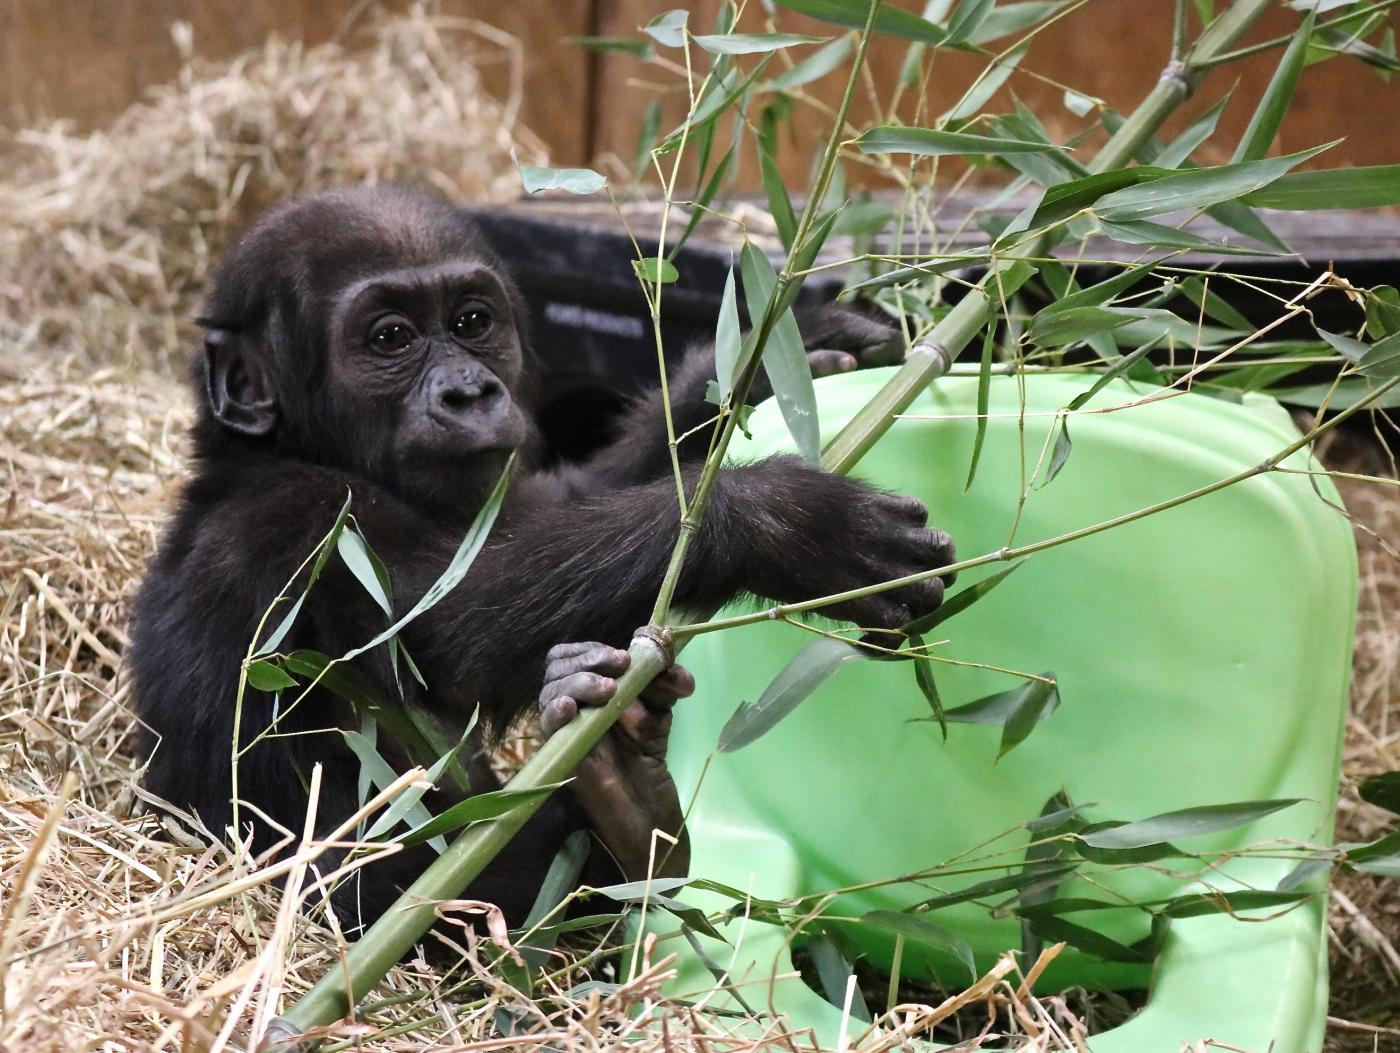 Moke the baby gorilla